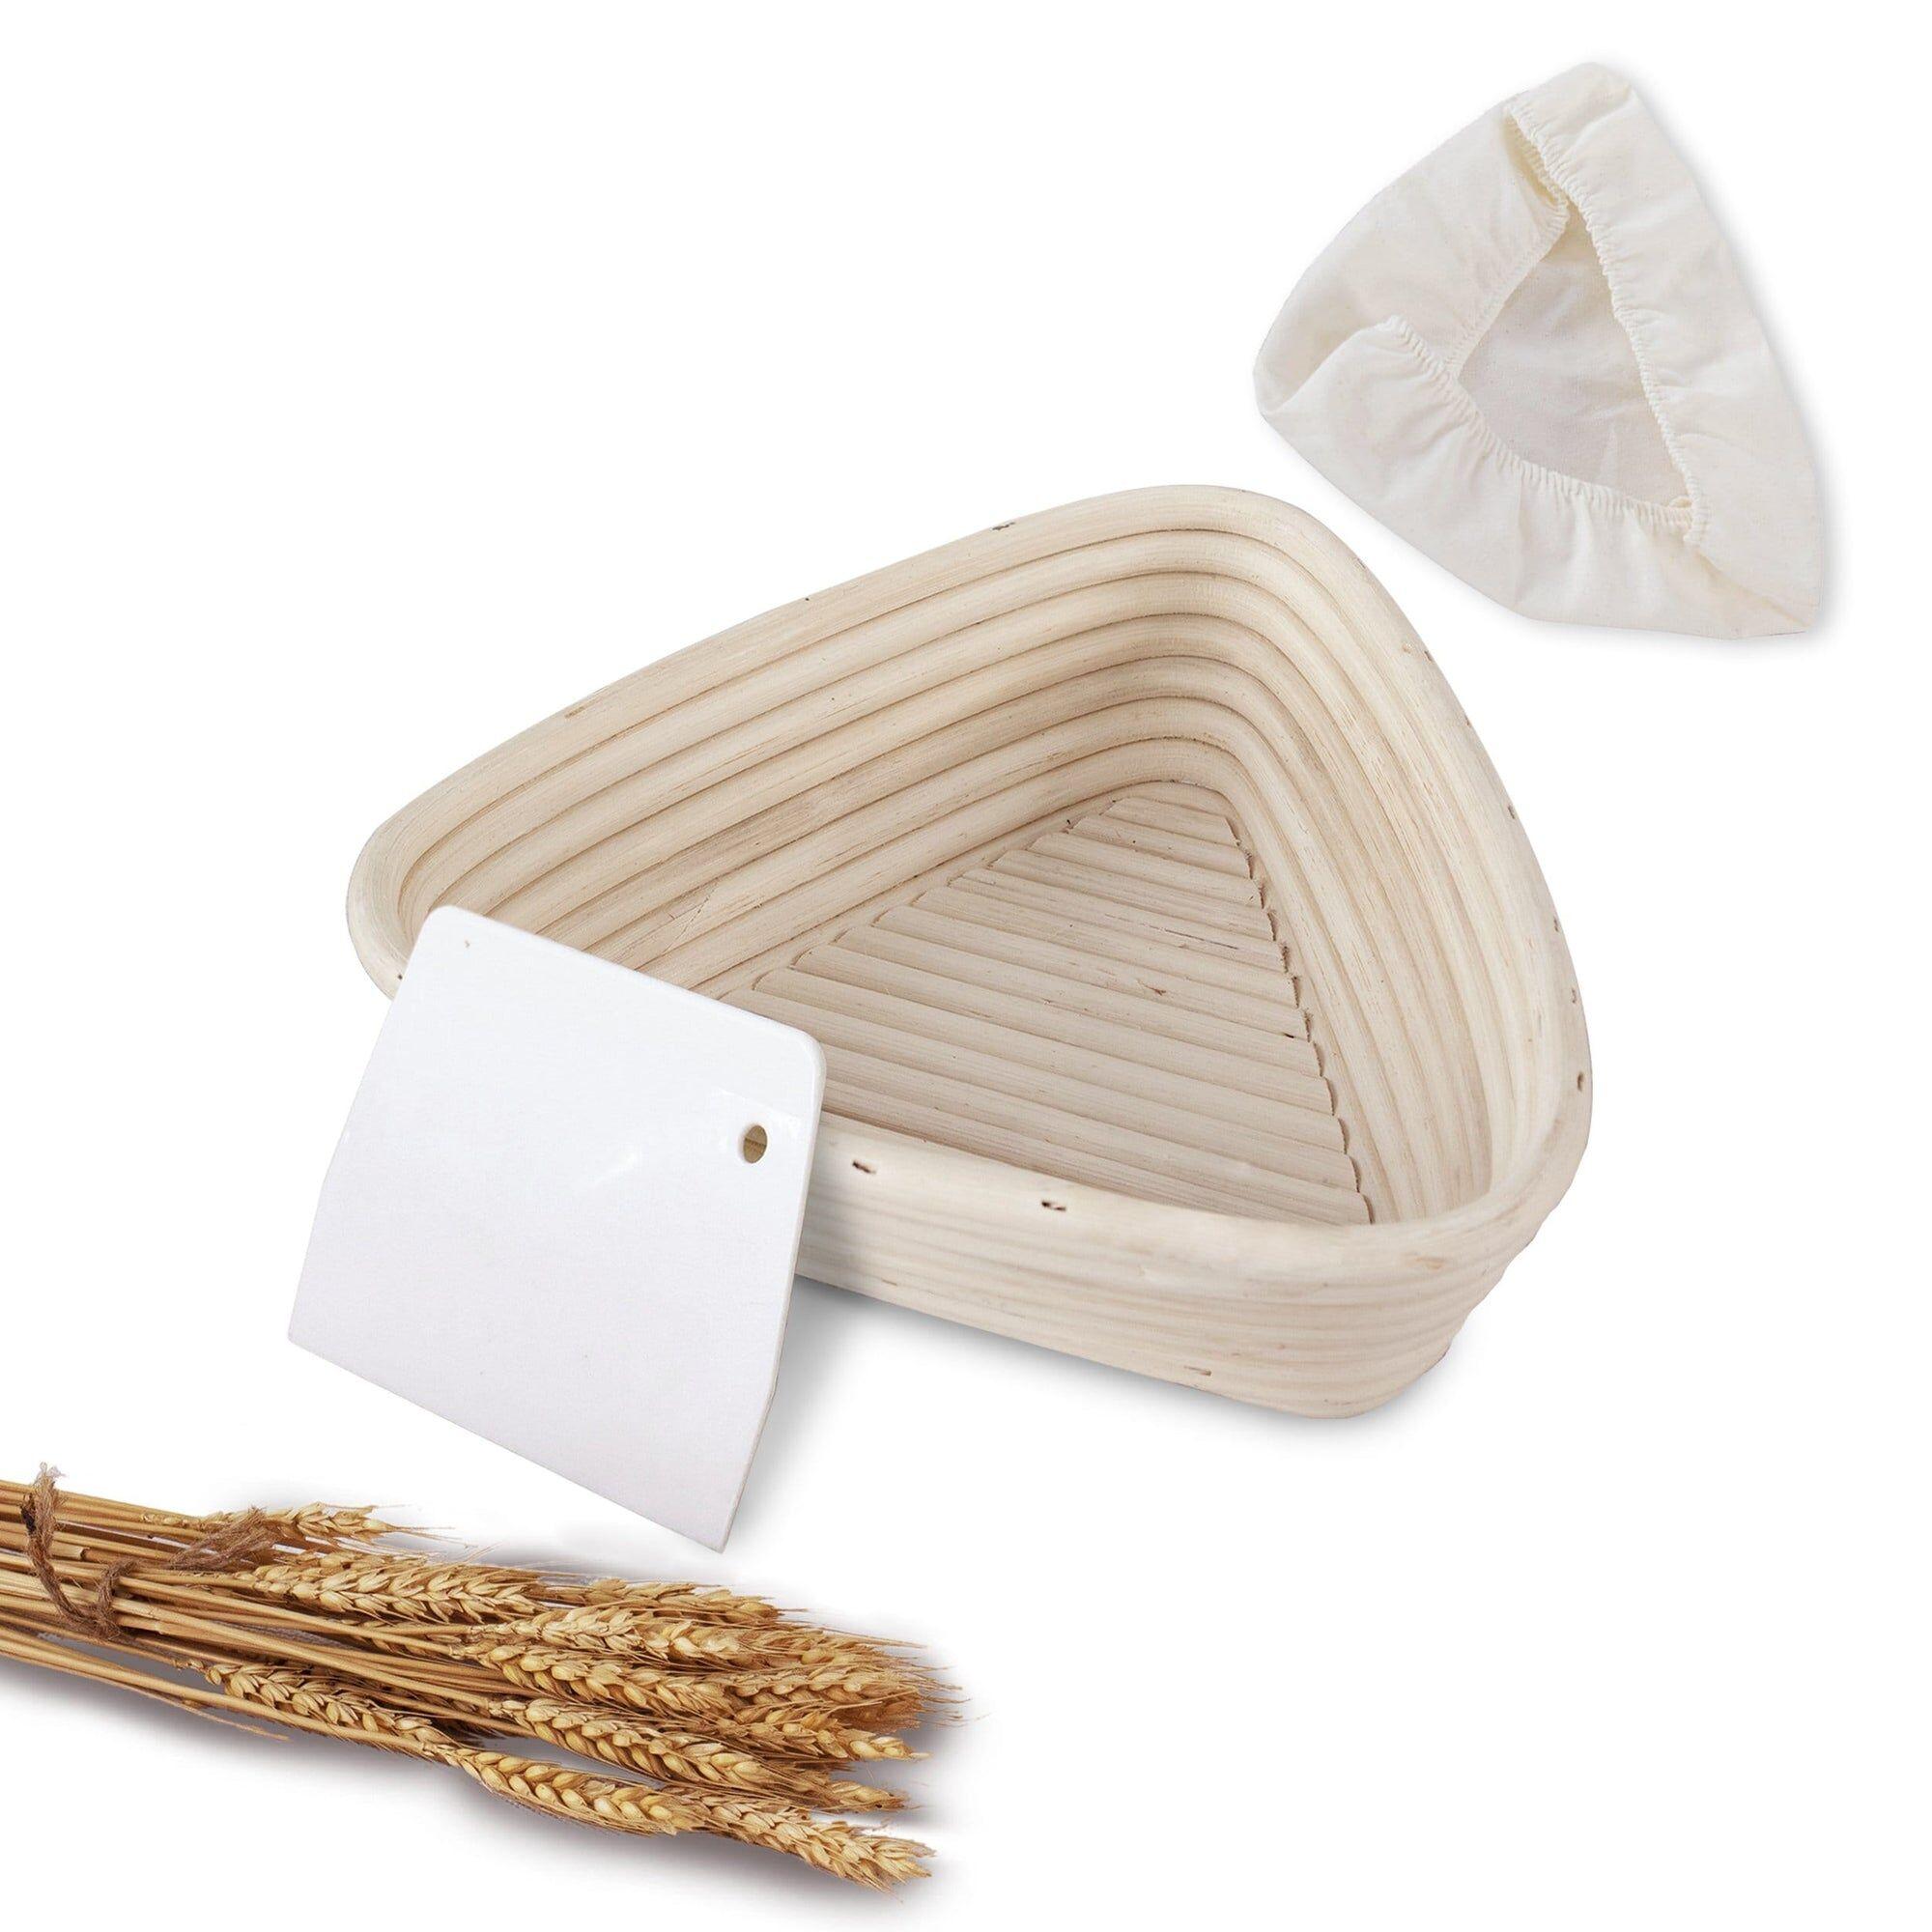 MadeTerra 9-Inch Triangle Banneton Bread Proofing Basket Set